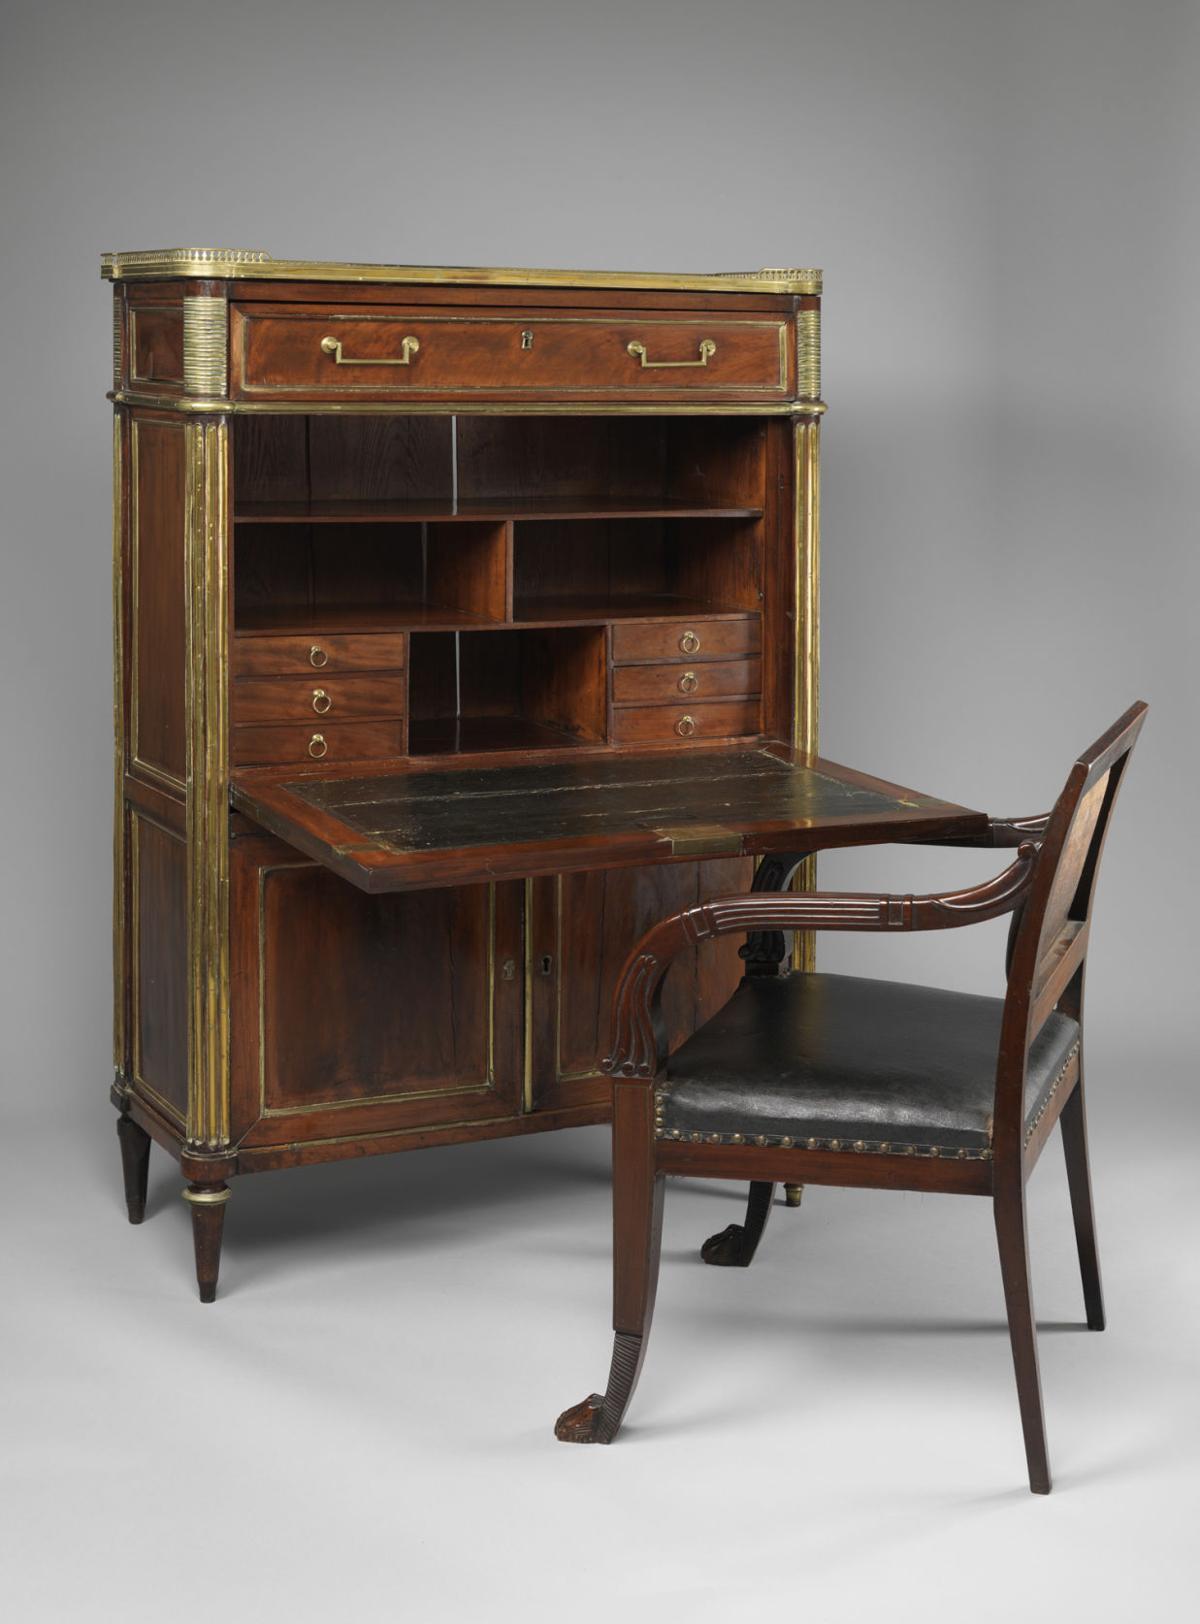 James Monroe's desk